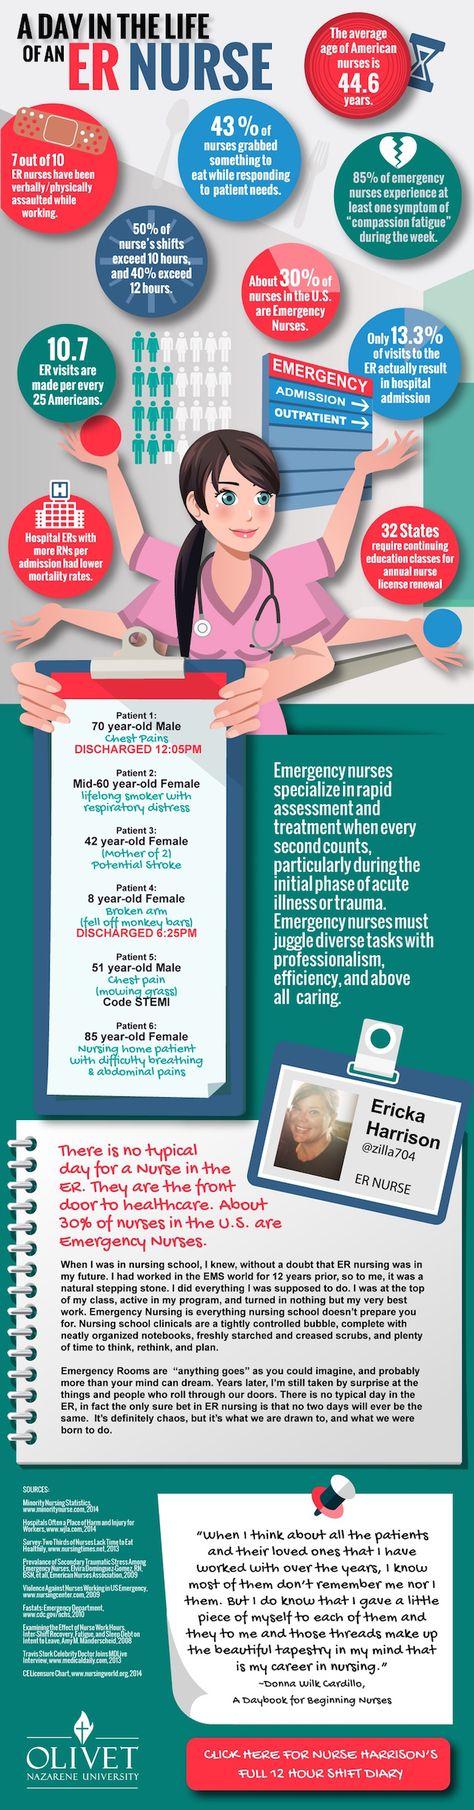 A Tribute to Emergency Room Nurses